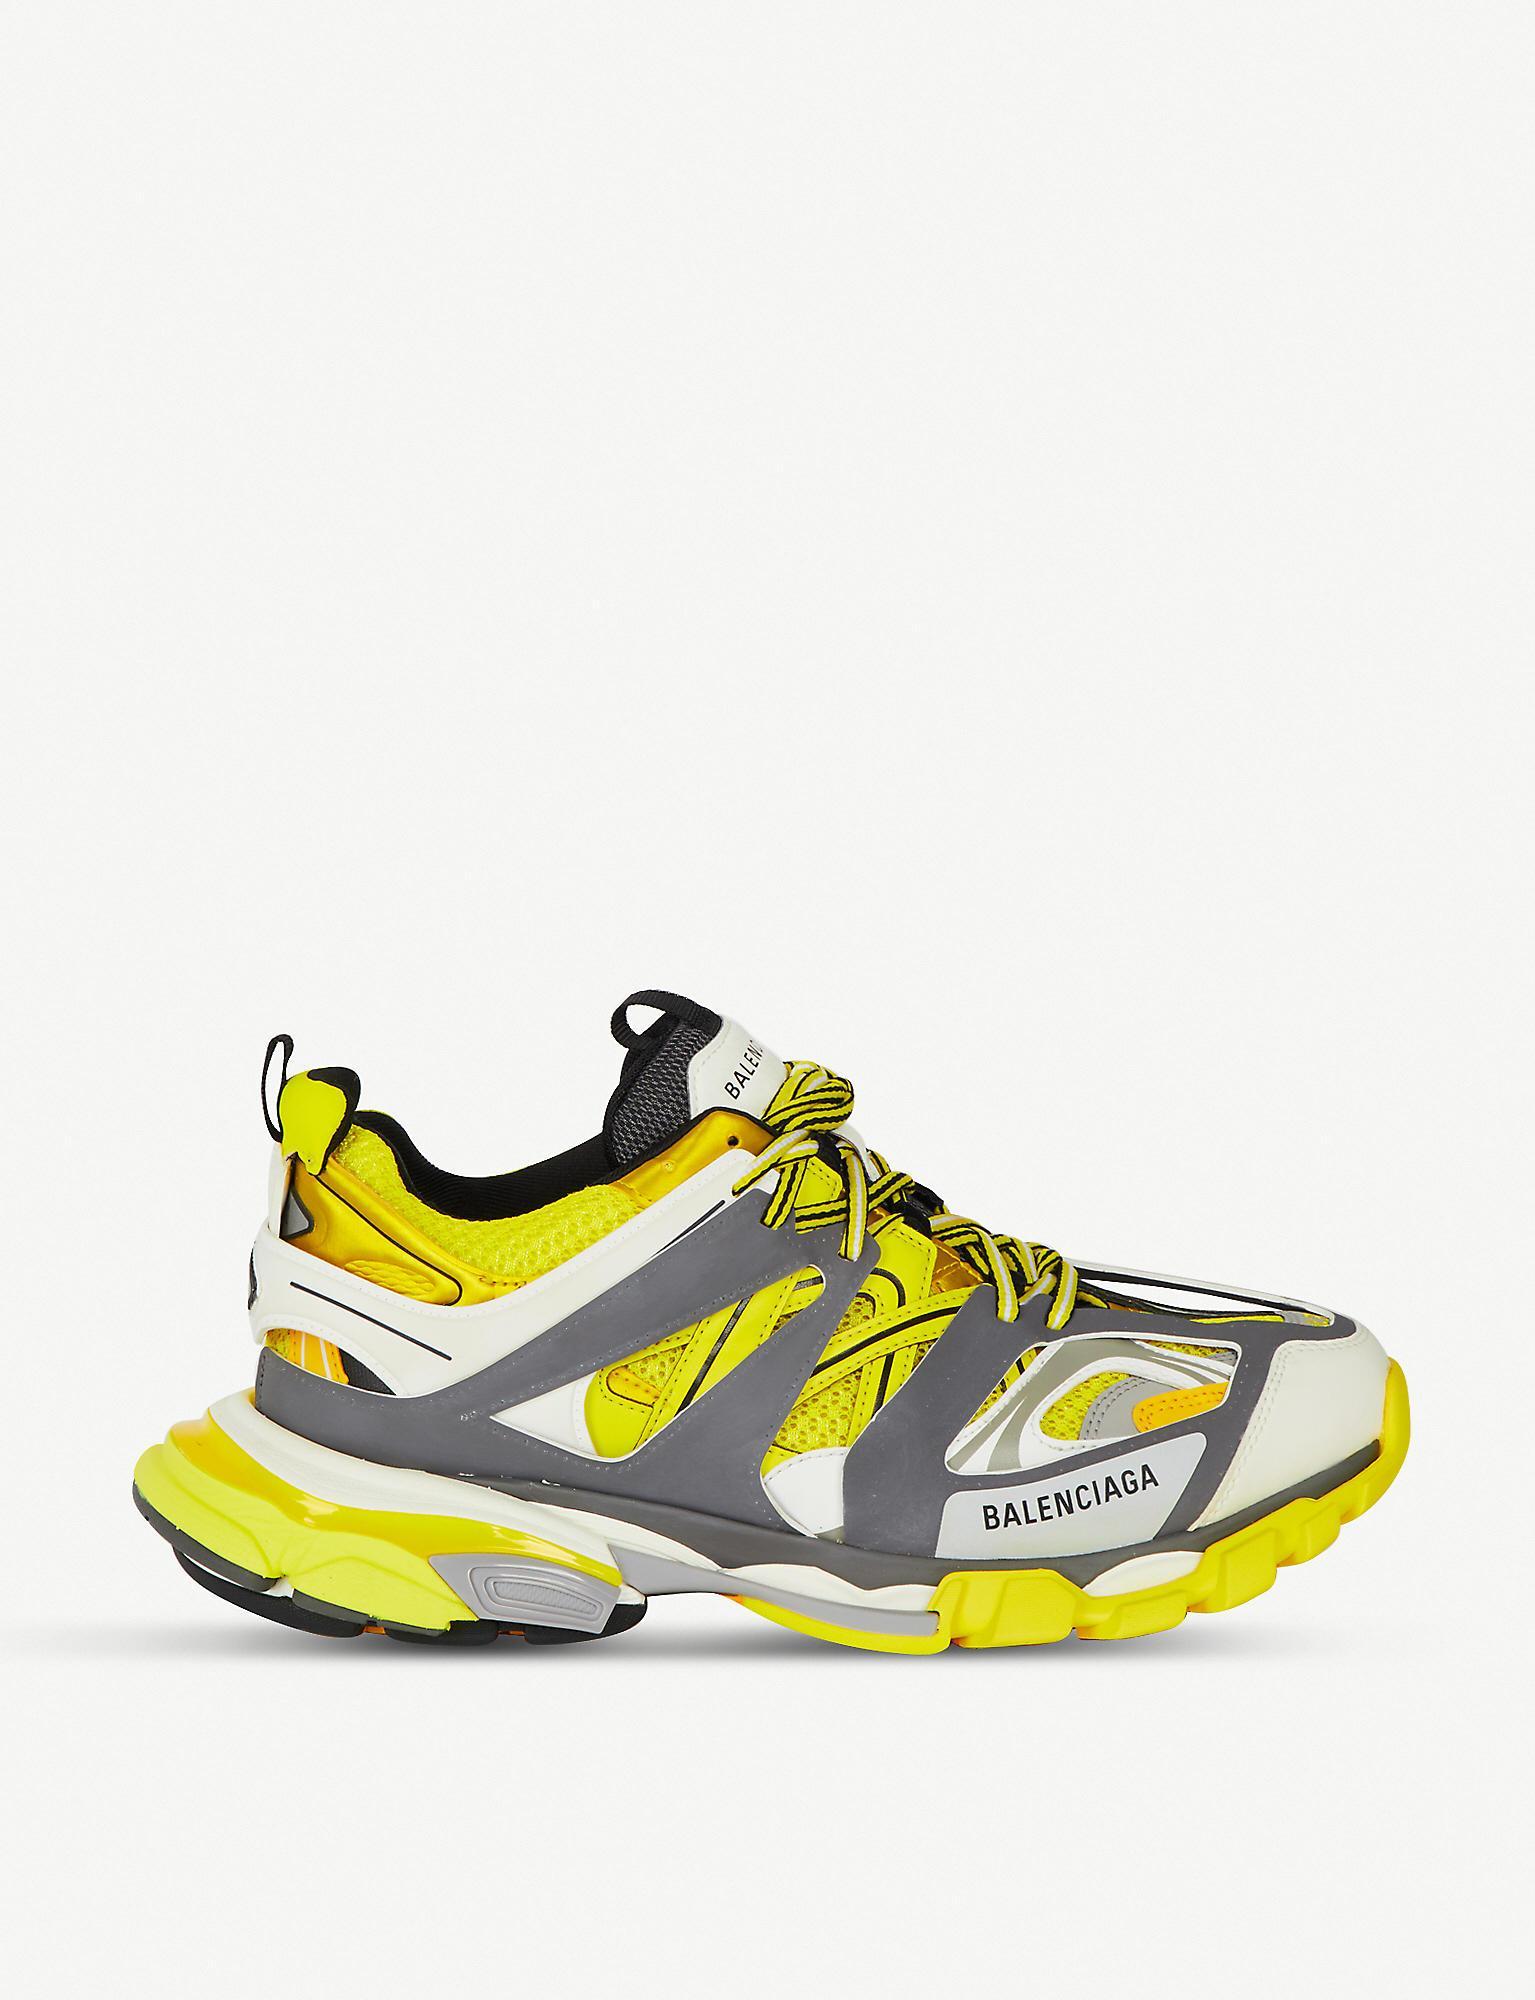 USED Balenciaga Track Trainers Running